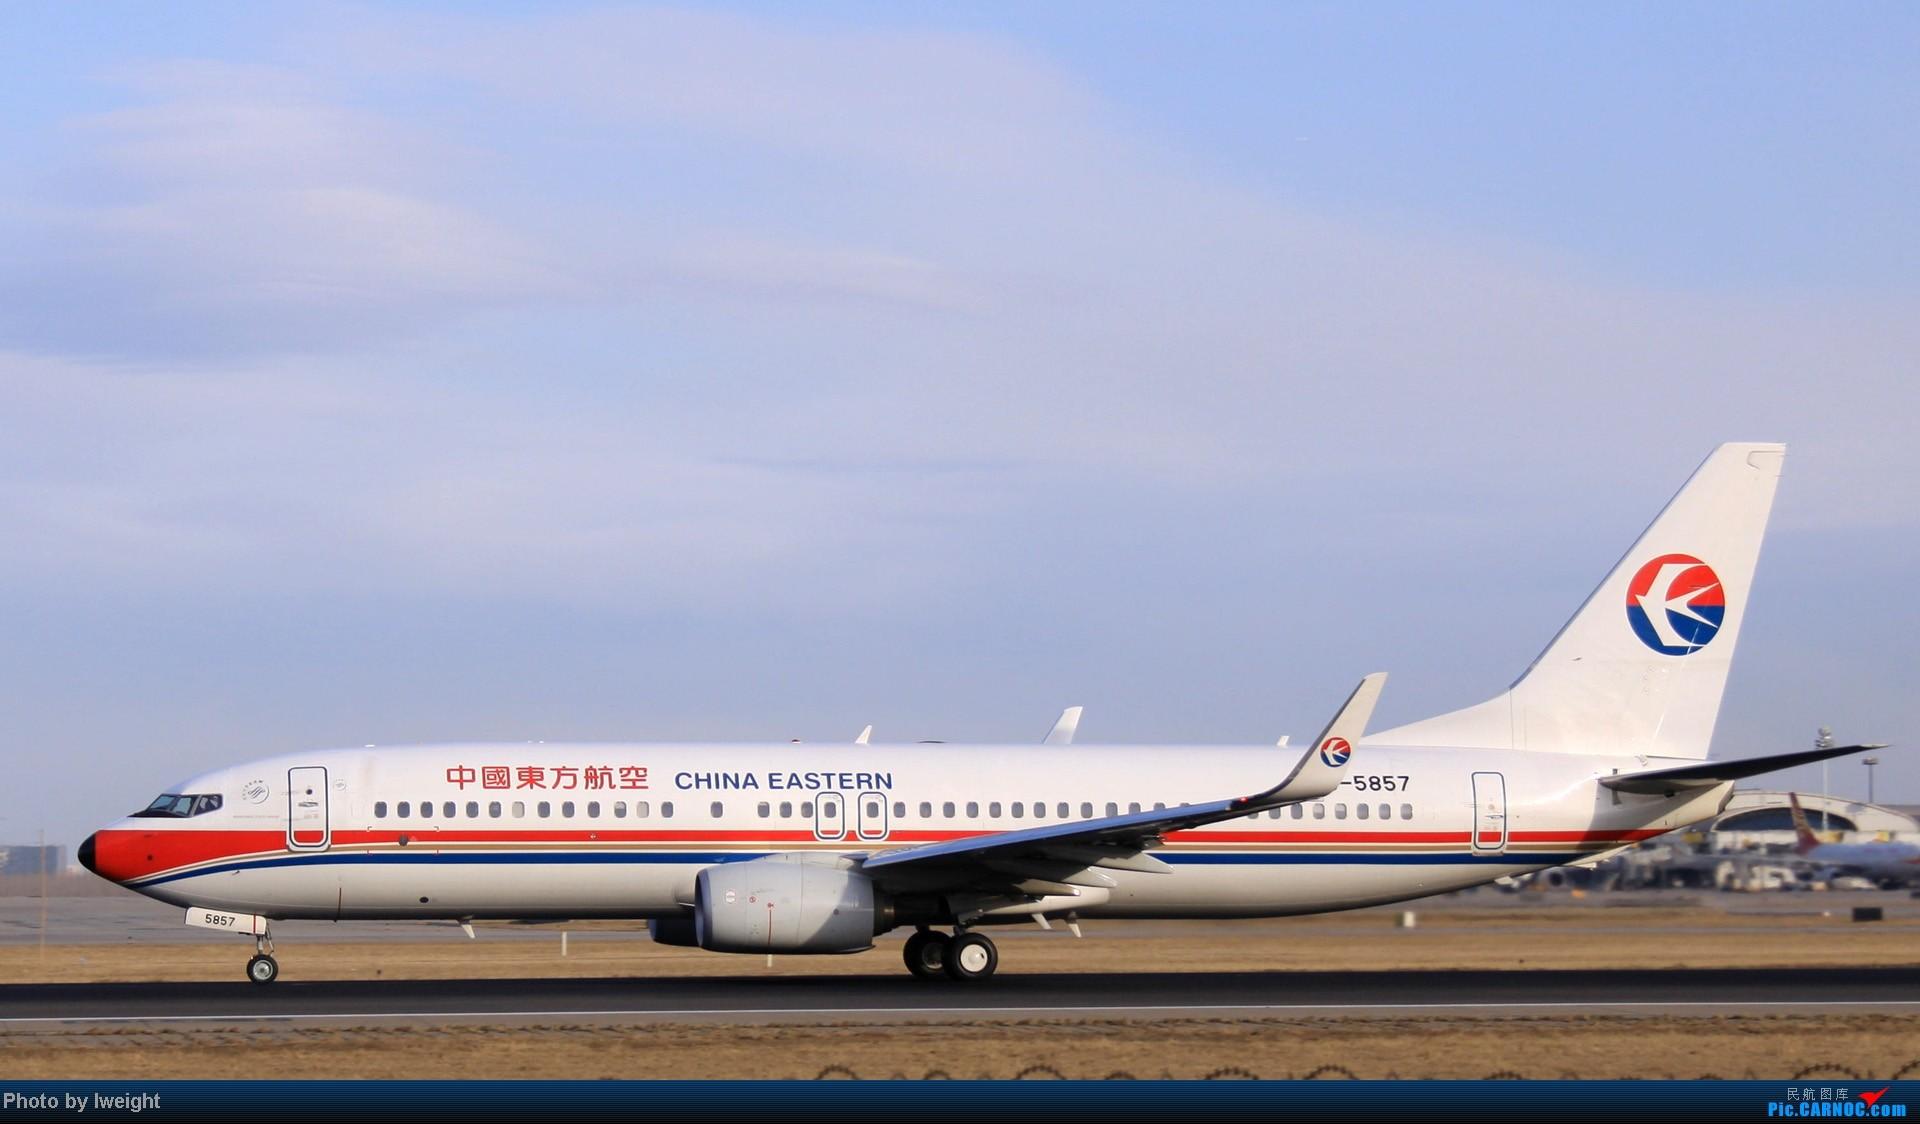 Re:[原创]今天下午瞎拍两个小时的杂图 BOEING 737-800 B-5857 中国北京首都机场